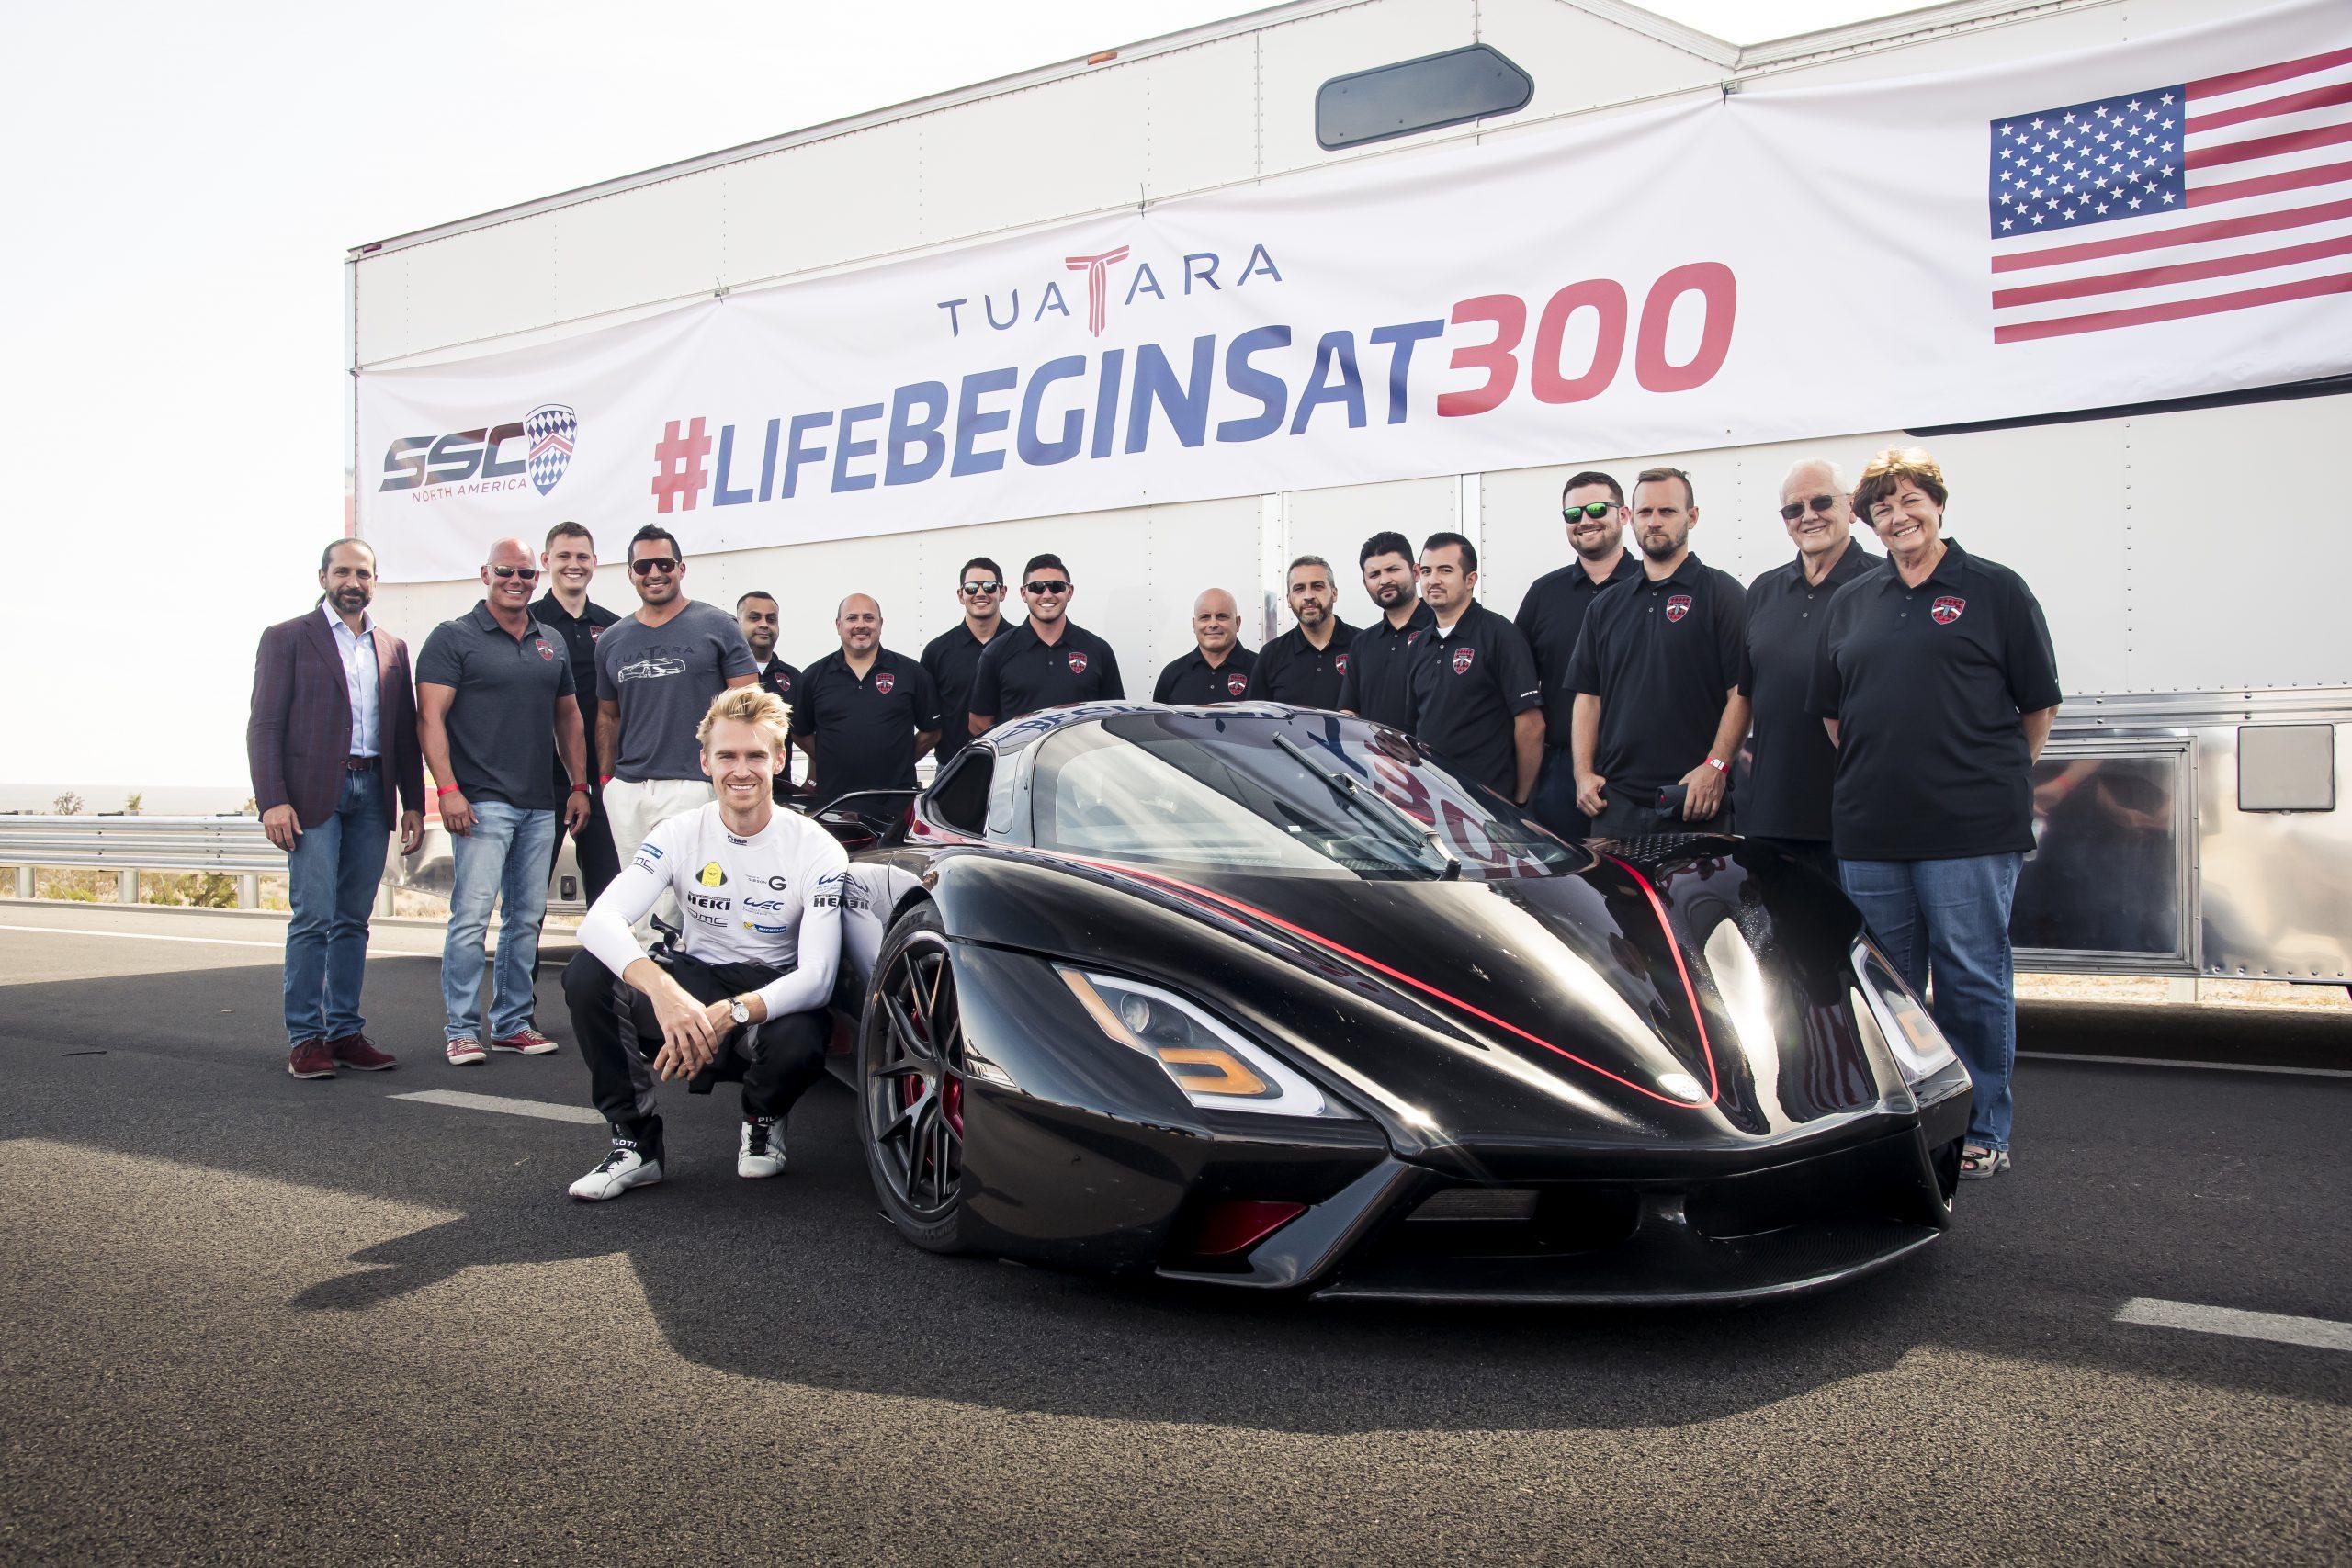 SSC Tuatara Production Car Speed Record team